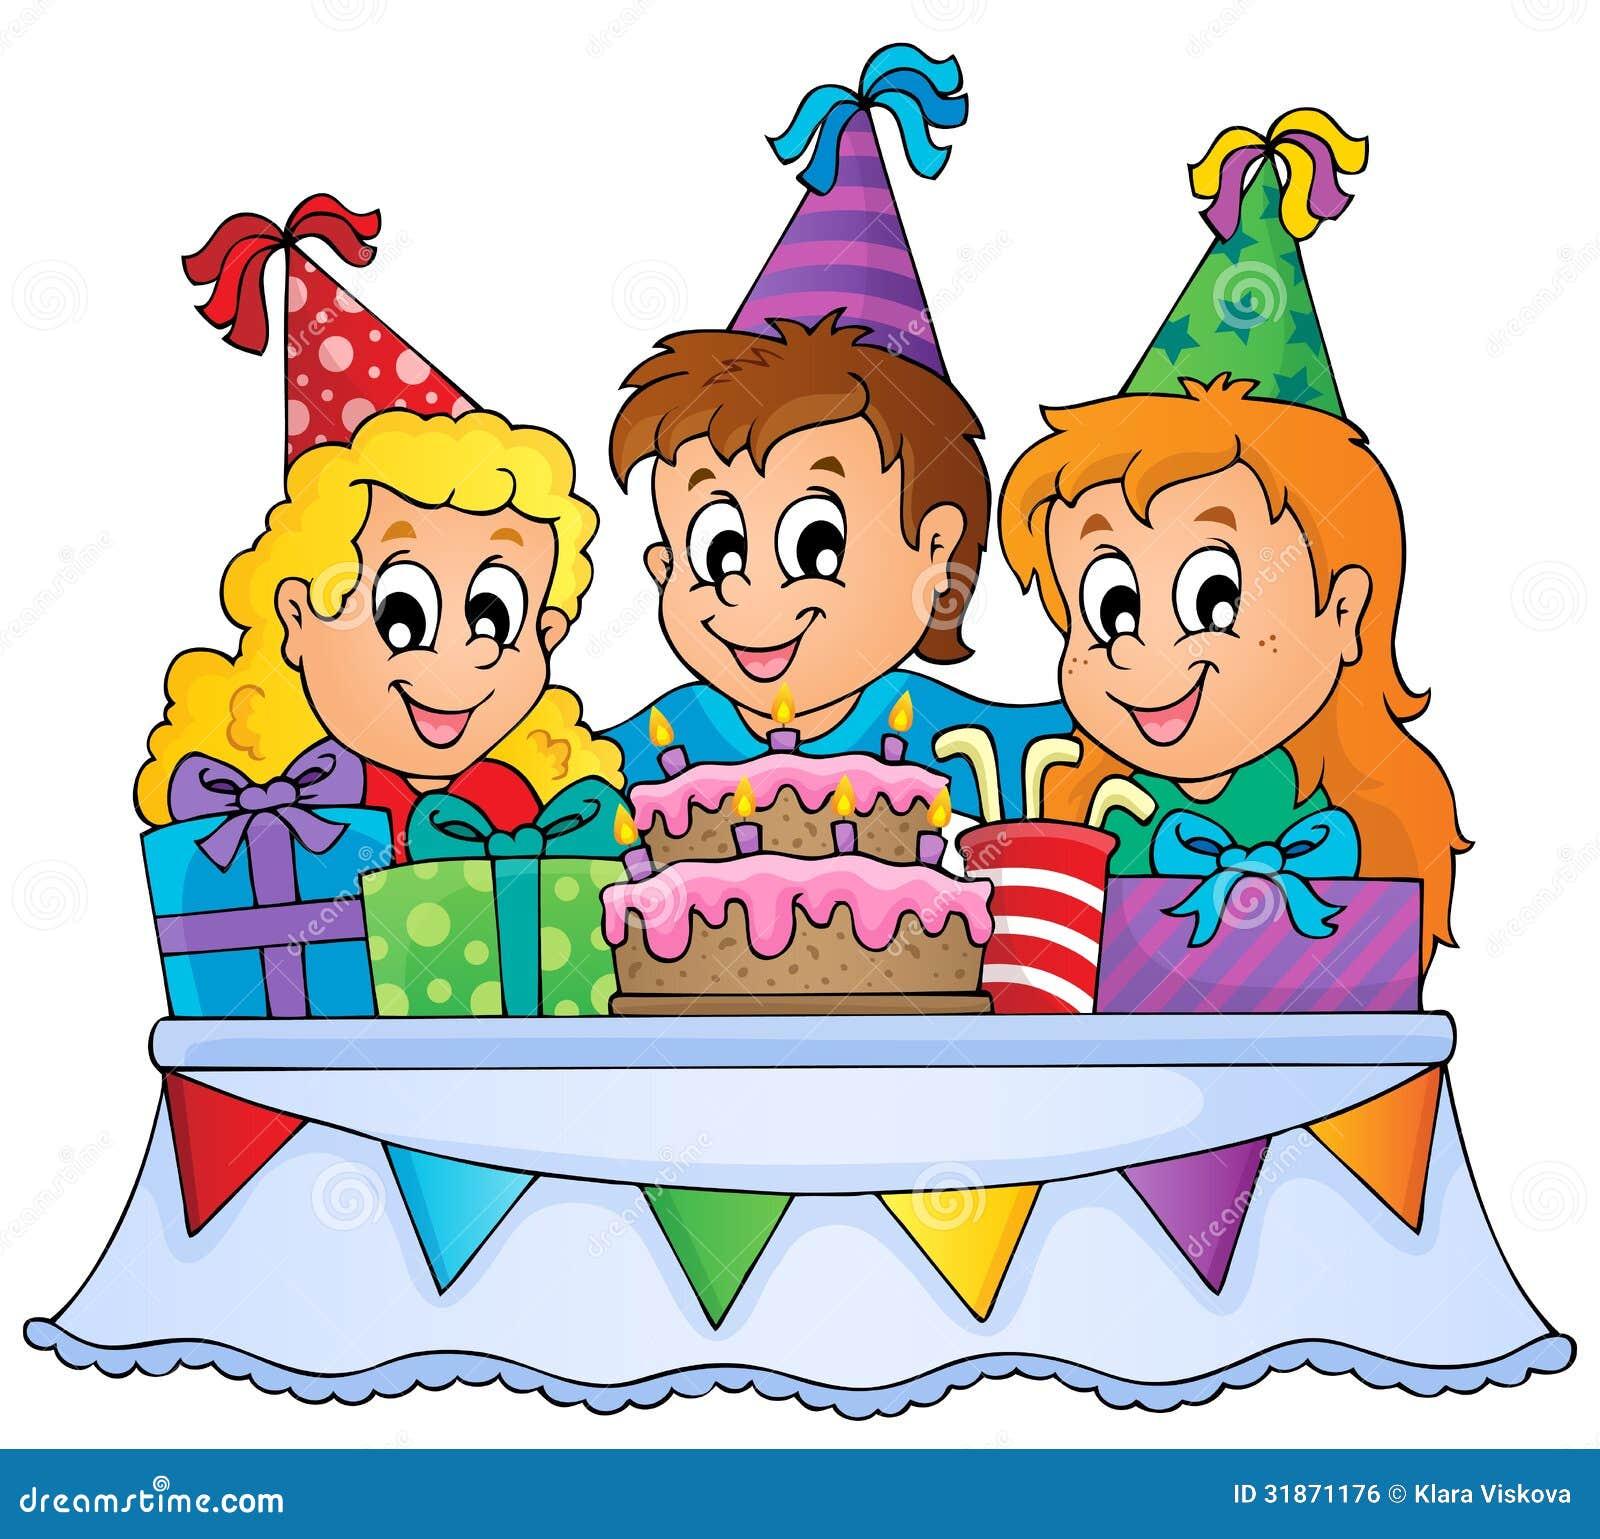 Kids Party Theme Image 1